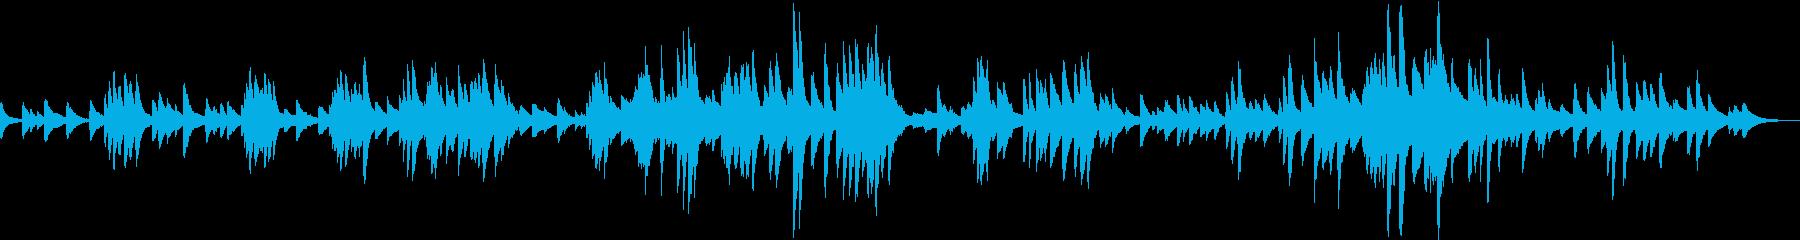 G線上のアリア ジャズ風アレンジ ピアノの再生済みの波形